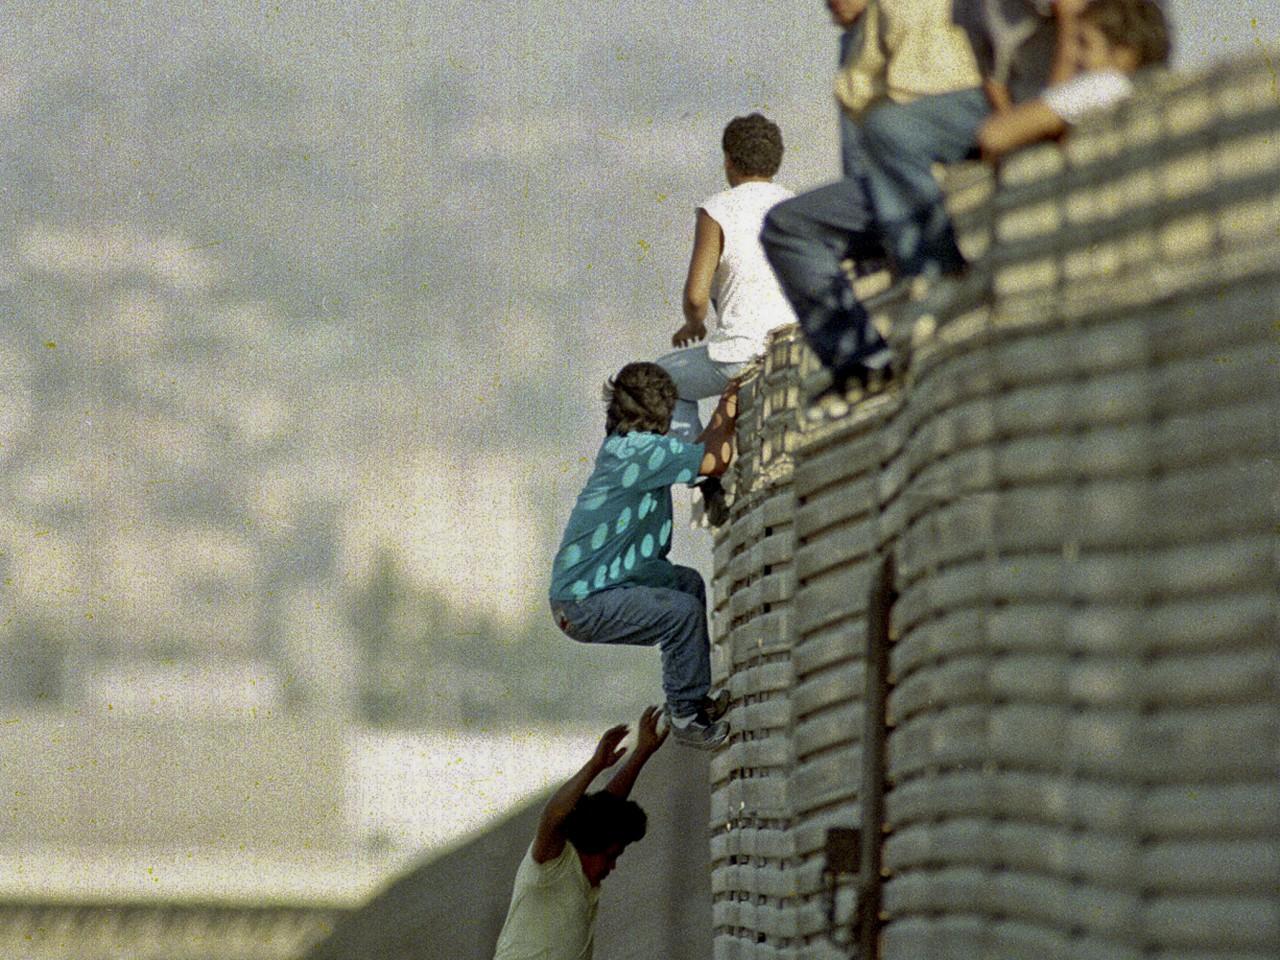 How Arizona cheats immigration reform - Salon.